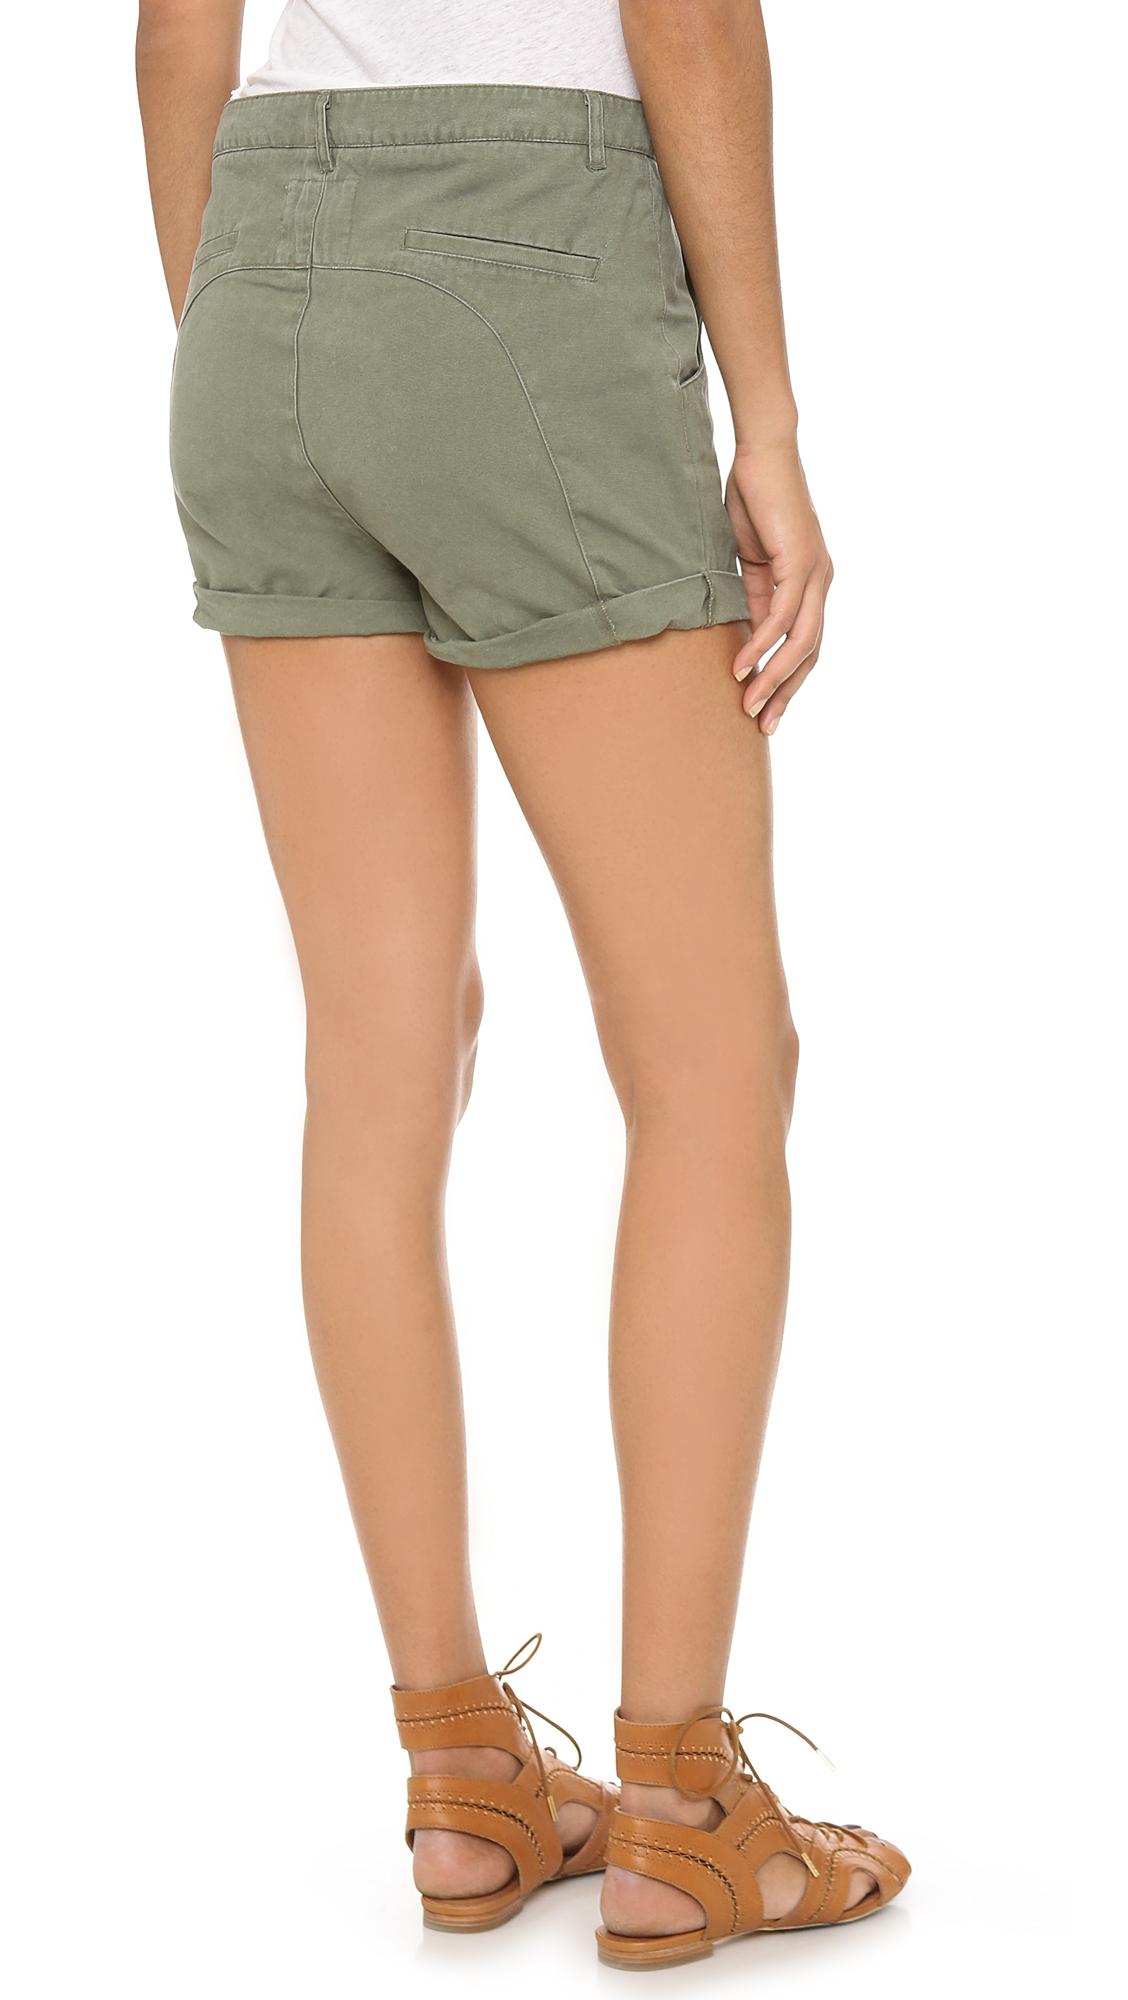 lyst one teaspoon captain wilde shorts khaki in natural. Black Bedroom Furniture Sets. Home Design Ideas